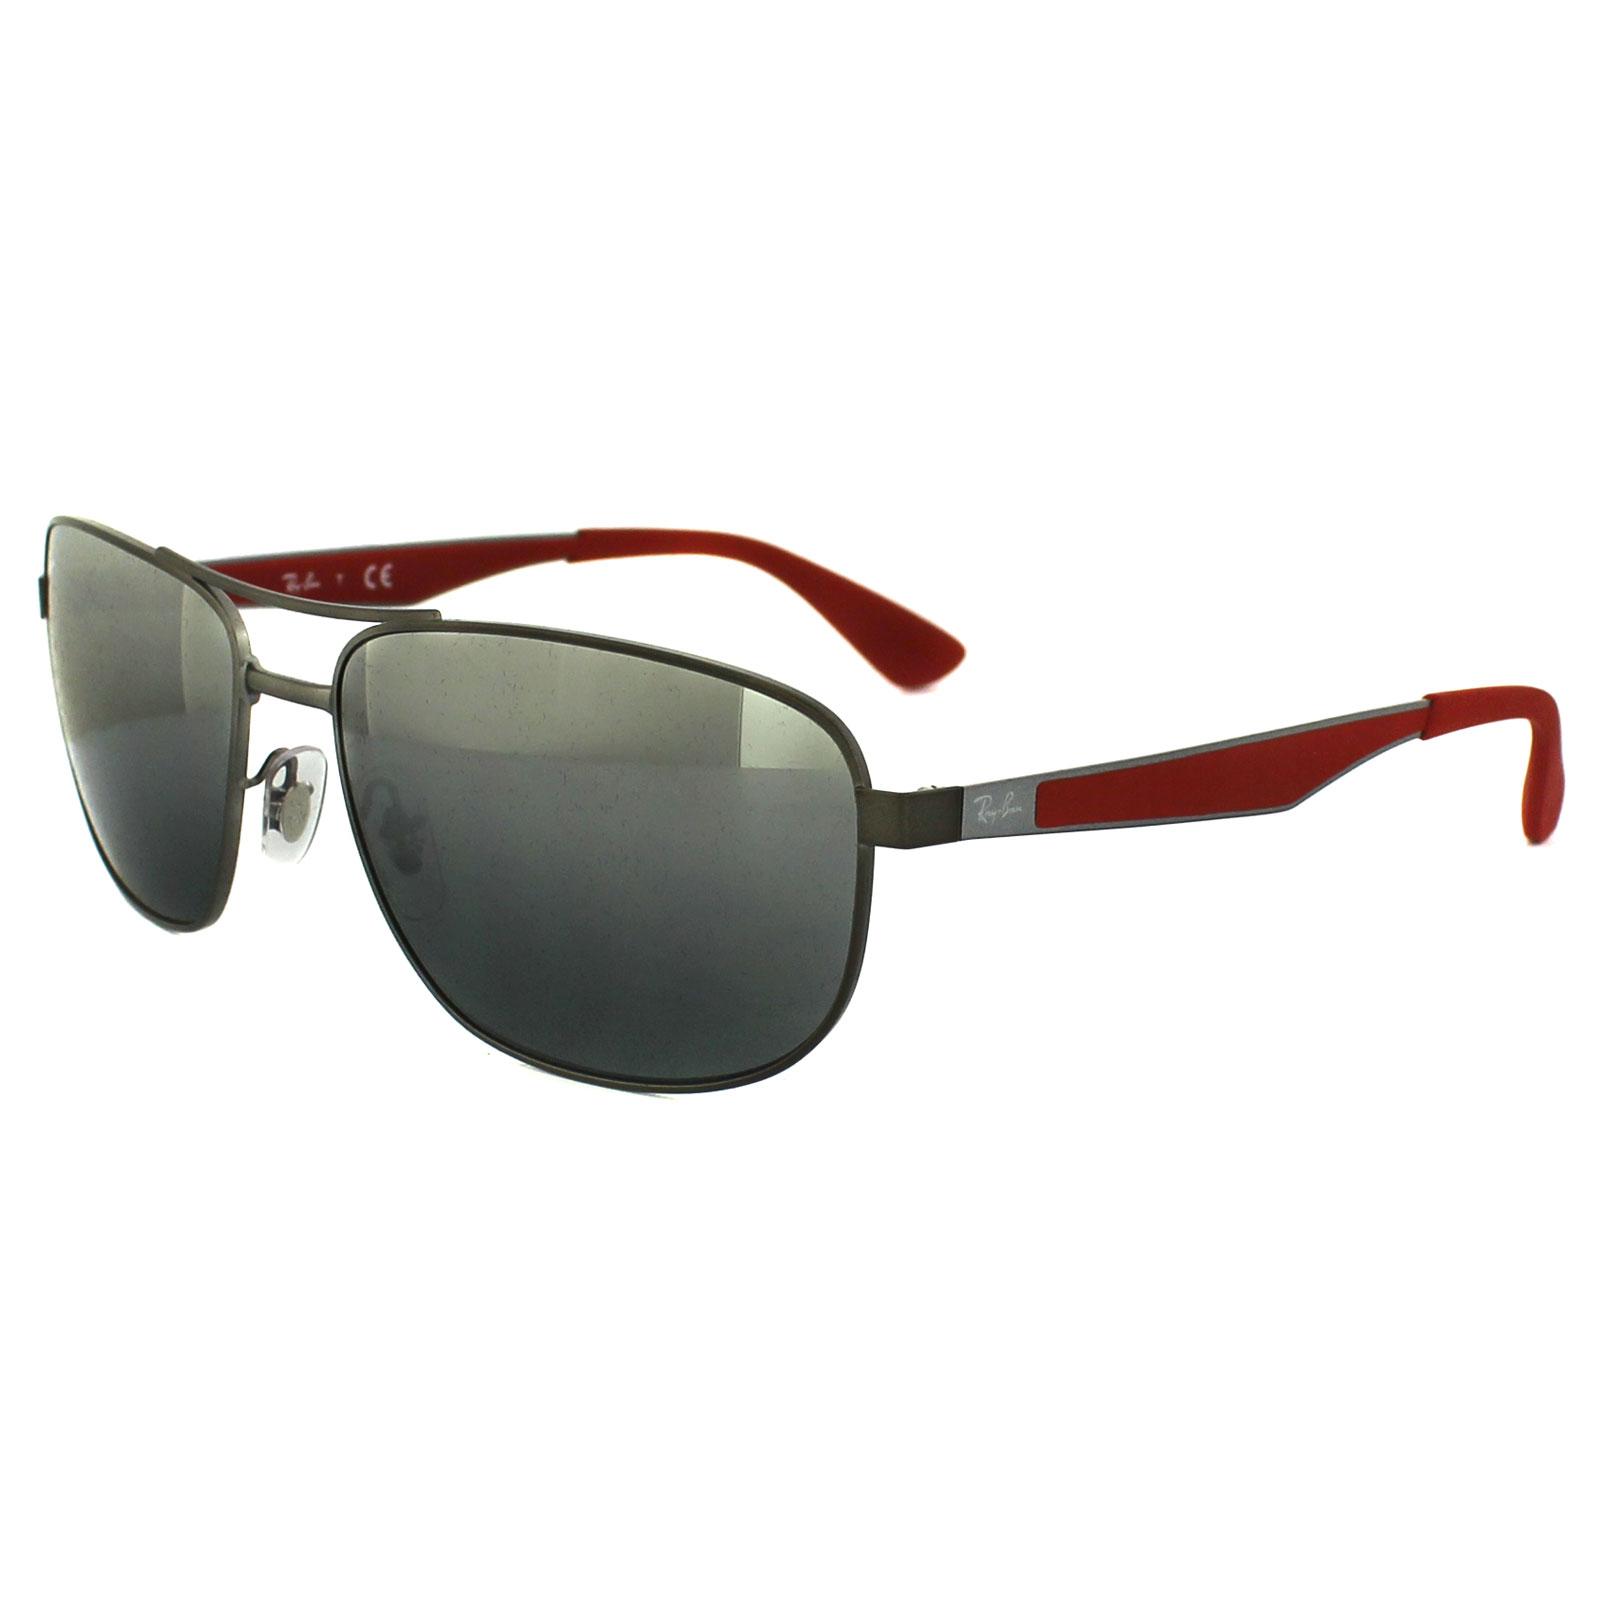 e0016cdb678 Sentinel Ray-Ban Sunglasses 3528 029 88 Matt Gunmetal Grey Grey Silver  Mirror Gradient